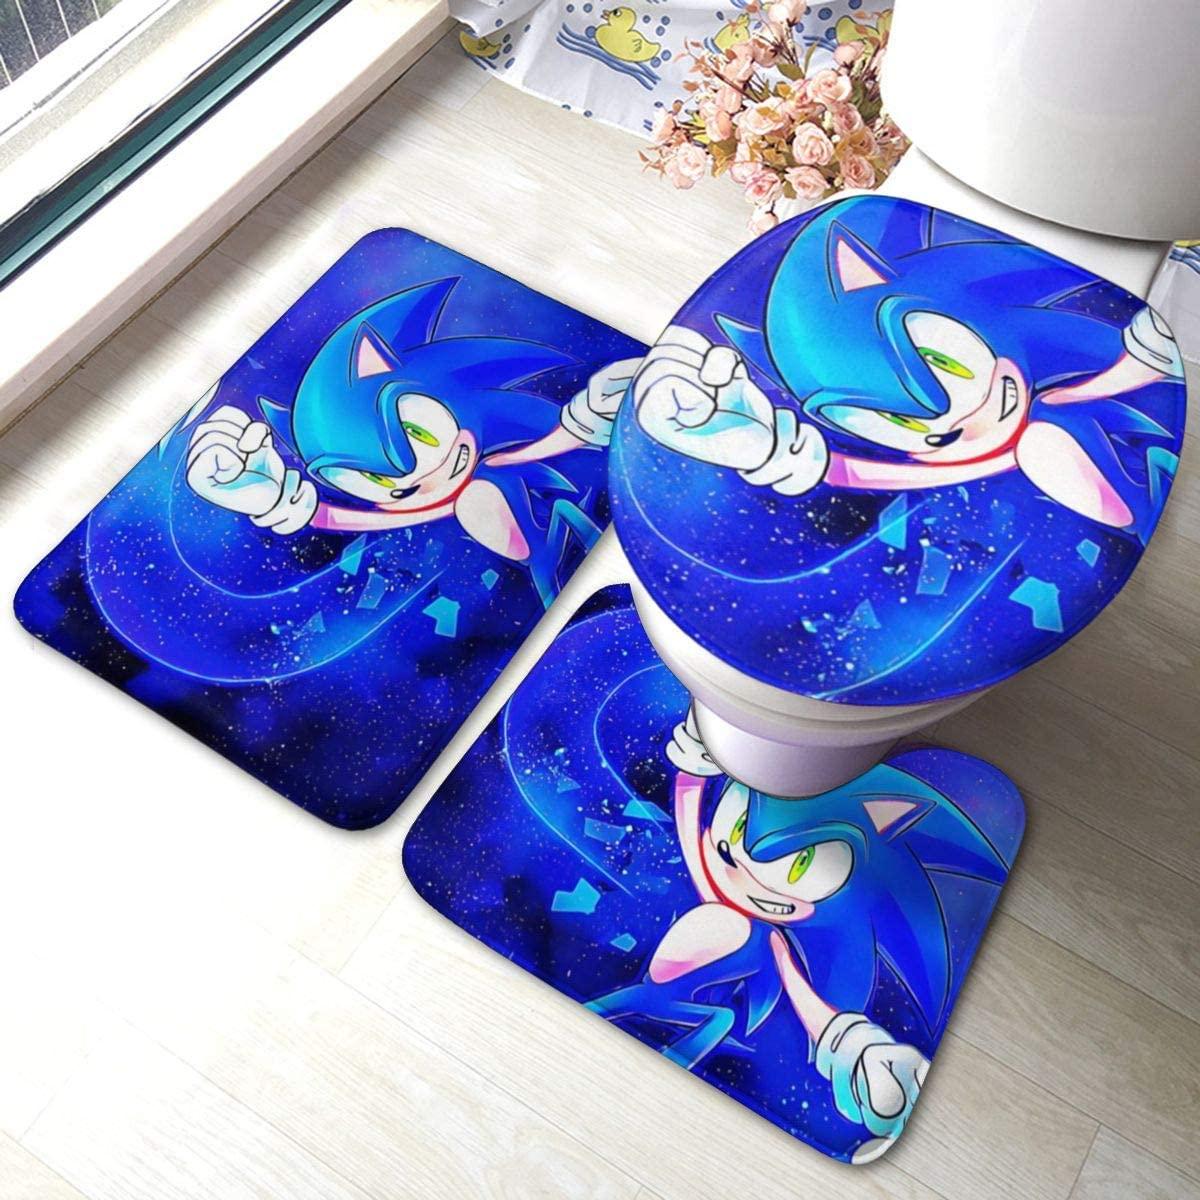 Sonic The Hedgehog Bath Rug 3 Piece Set Memory Foam Water-Absorbent Doormat Bathroom Rug Carpet U-Shaped Contour Rug + Toilet Lid Cover + Bath Mat Pad 23.5'' X 15.7''